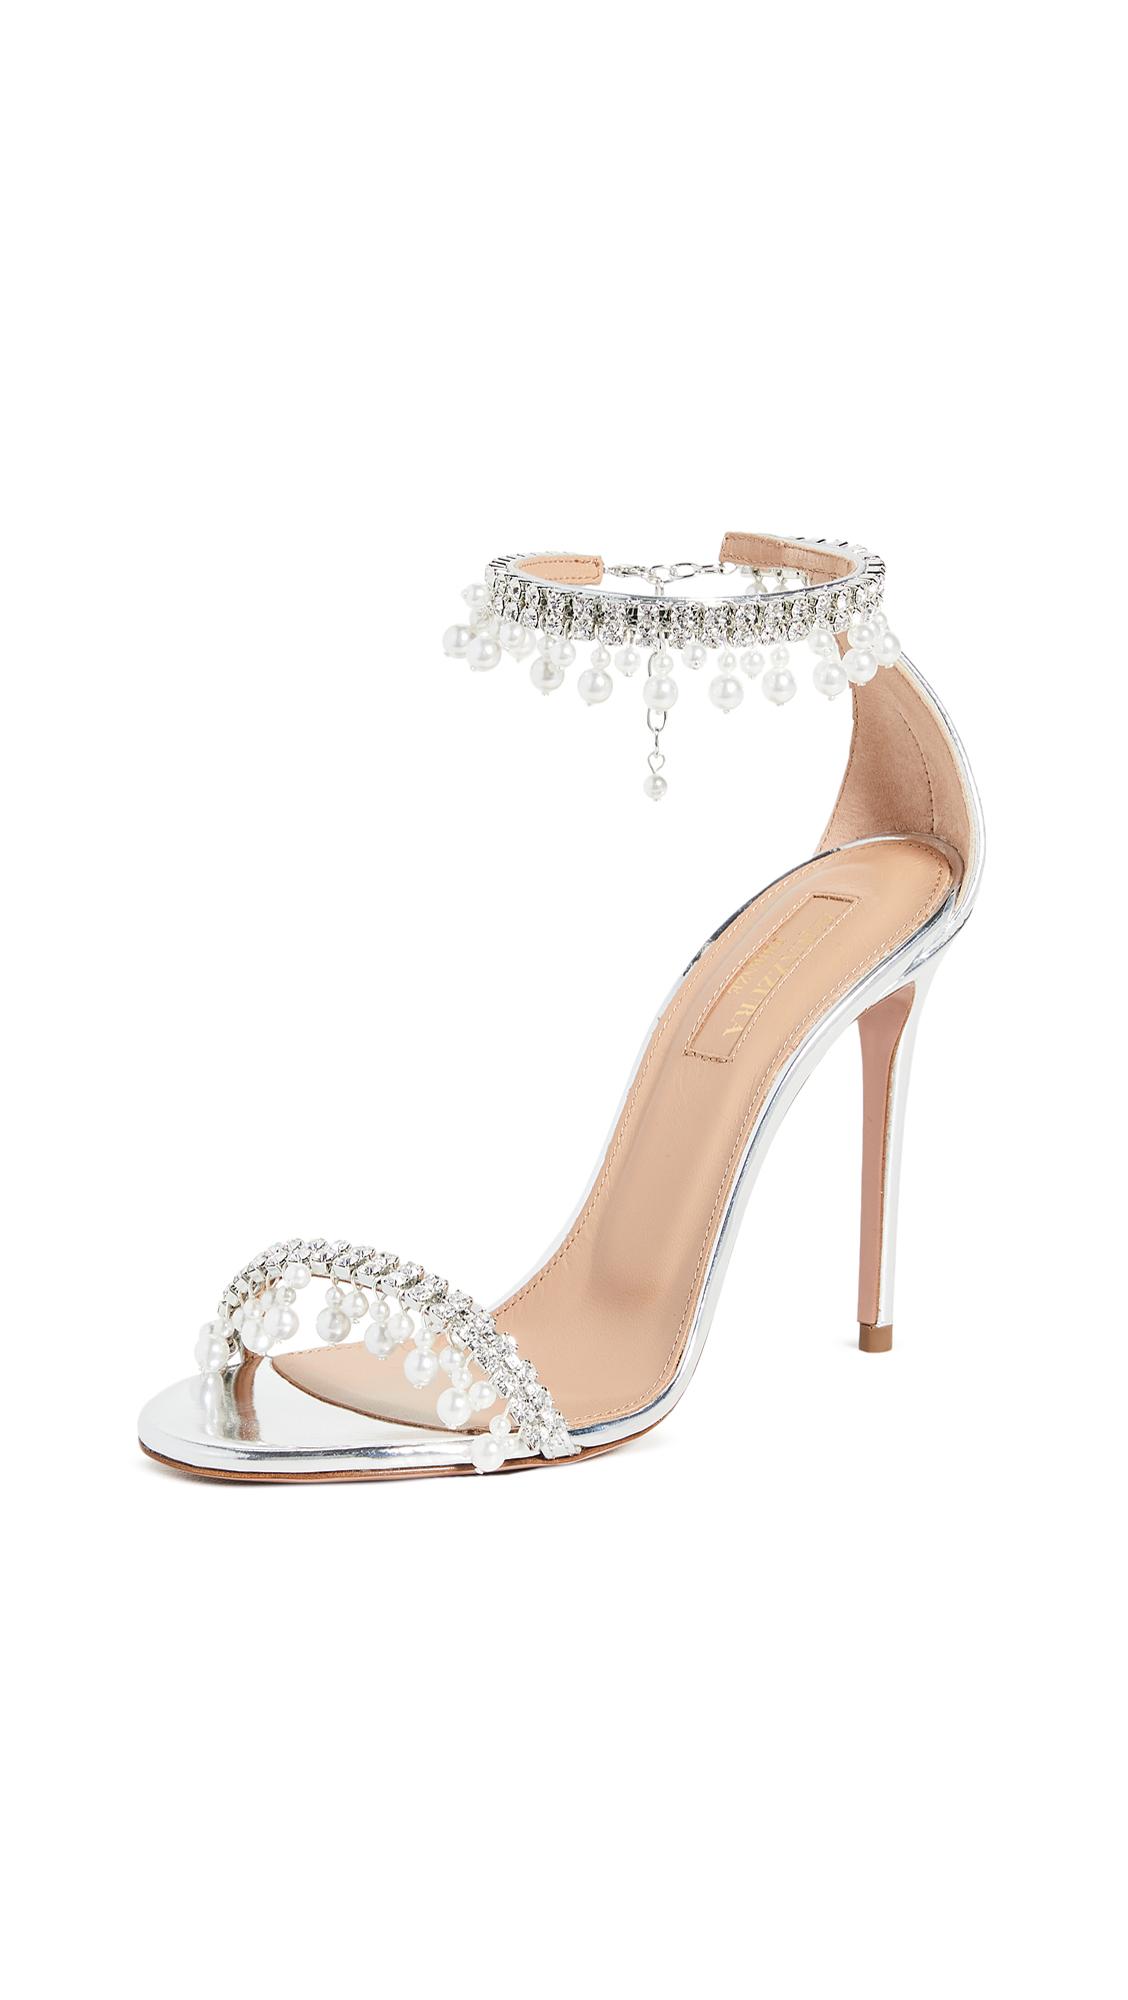 Buy Aquazzura online - photo of Aquazzura 105mm Exquisite Sandals